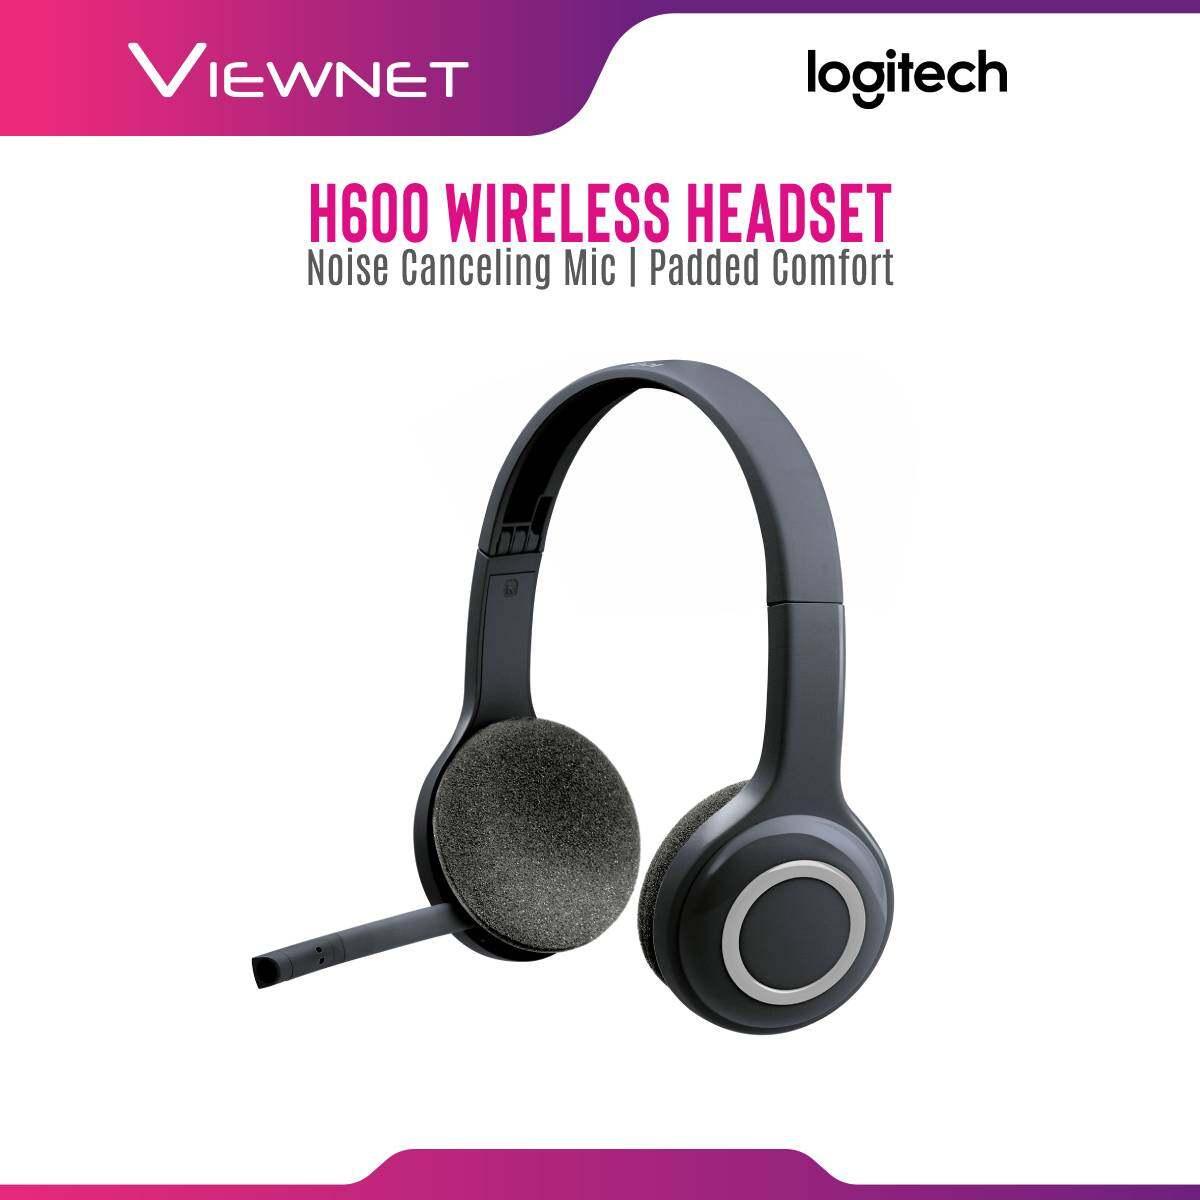 Logitech Wireless H600 Headset (981-000504)